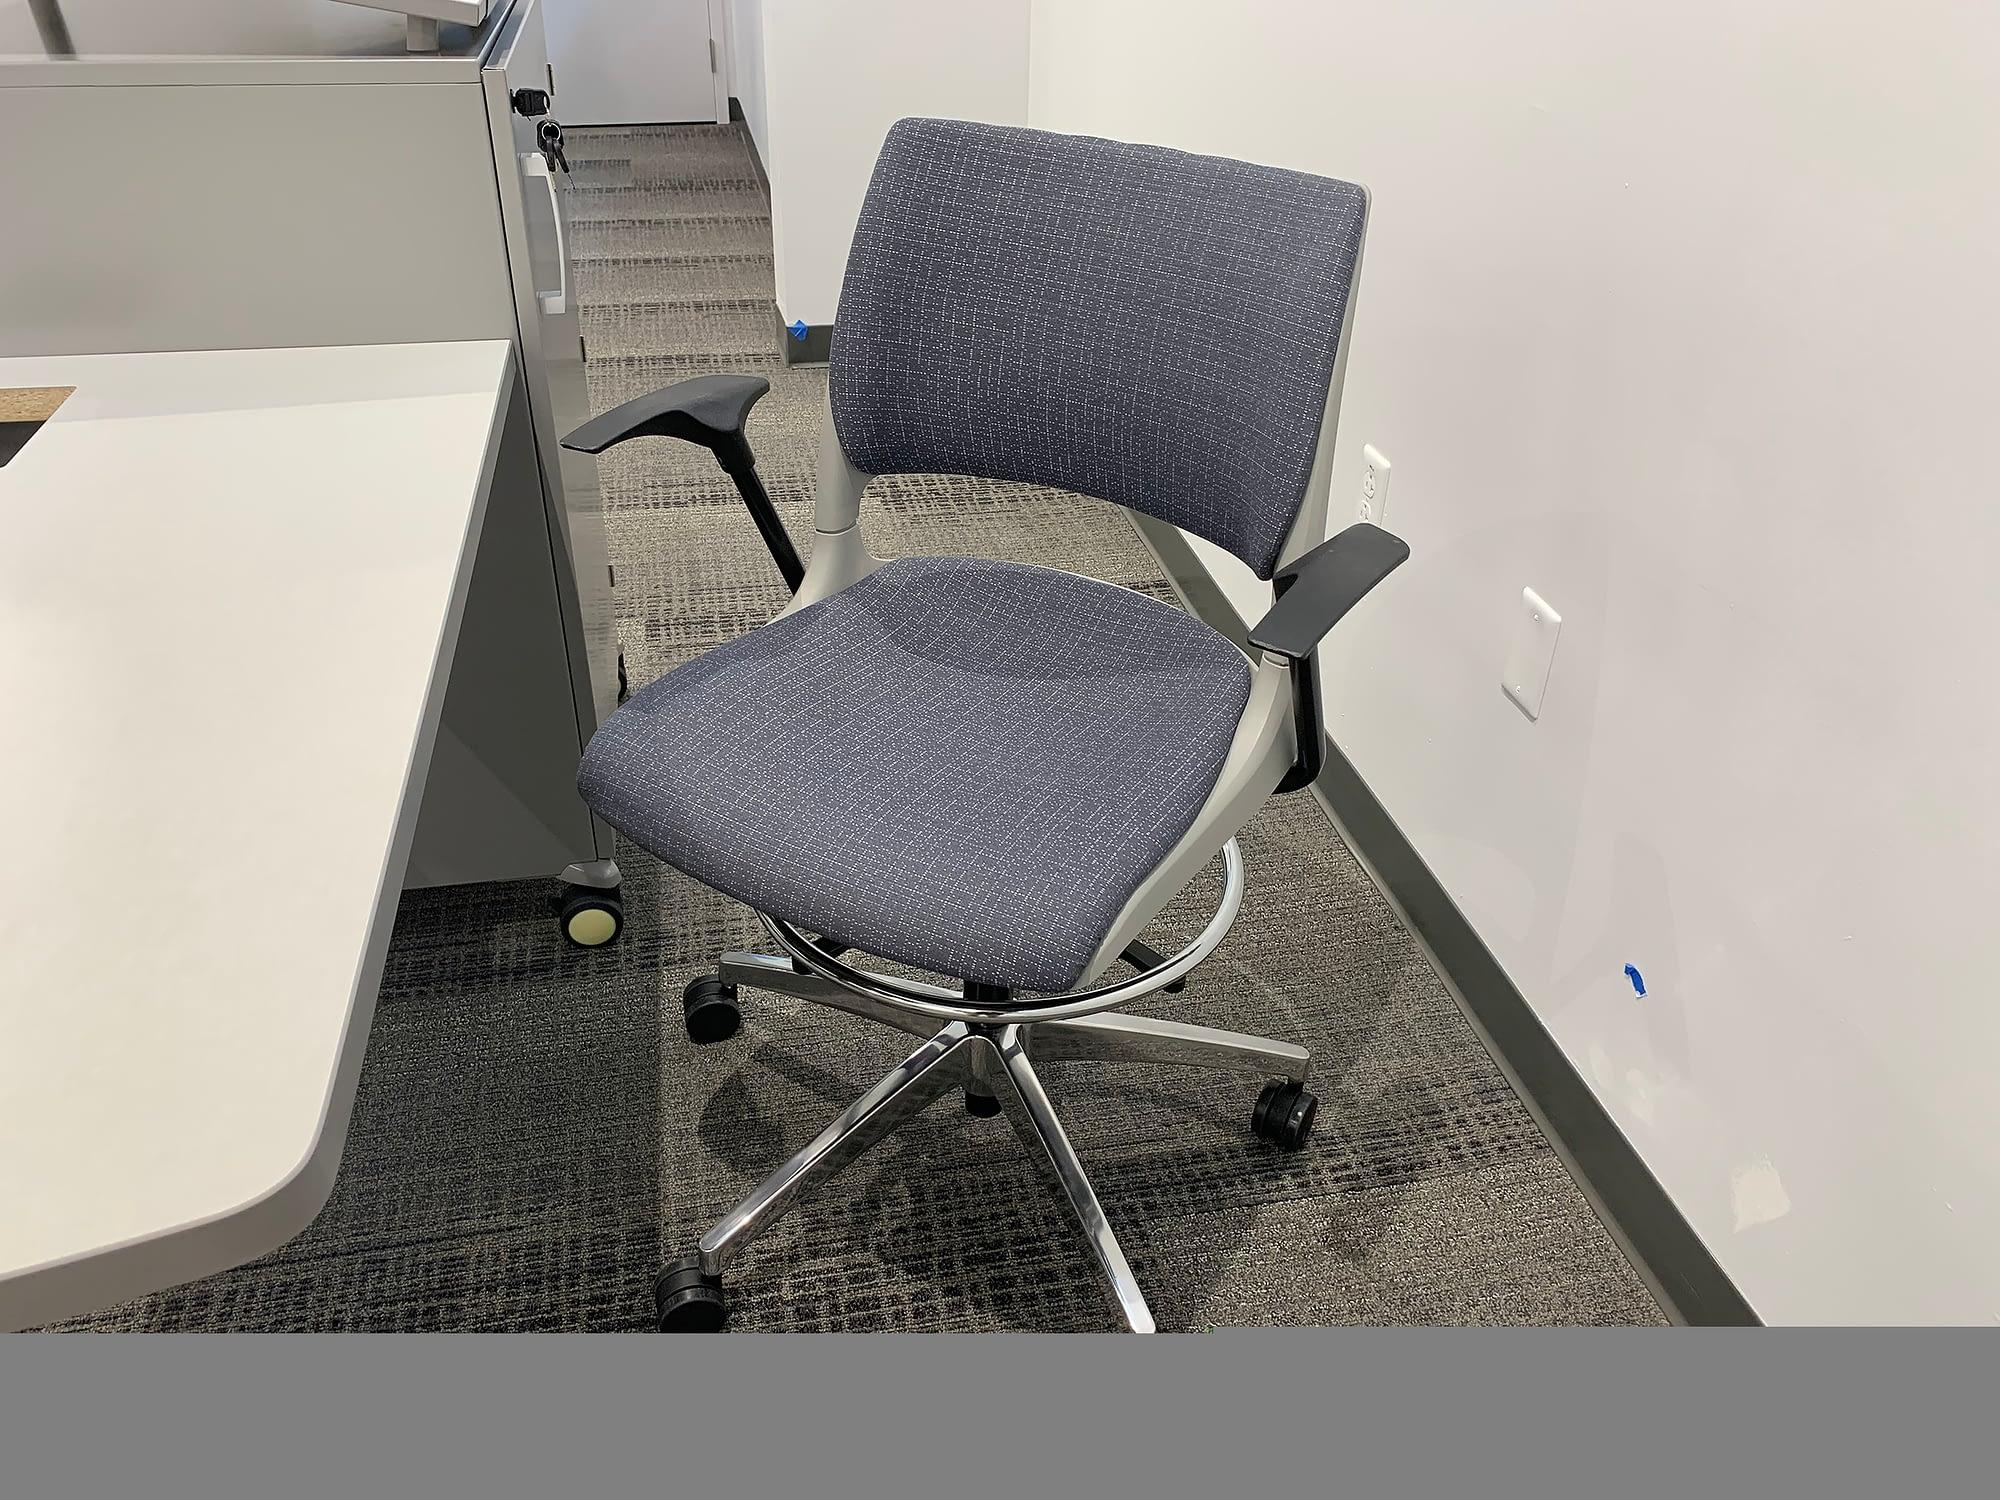 large classroom podium chair